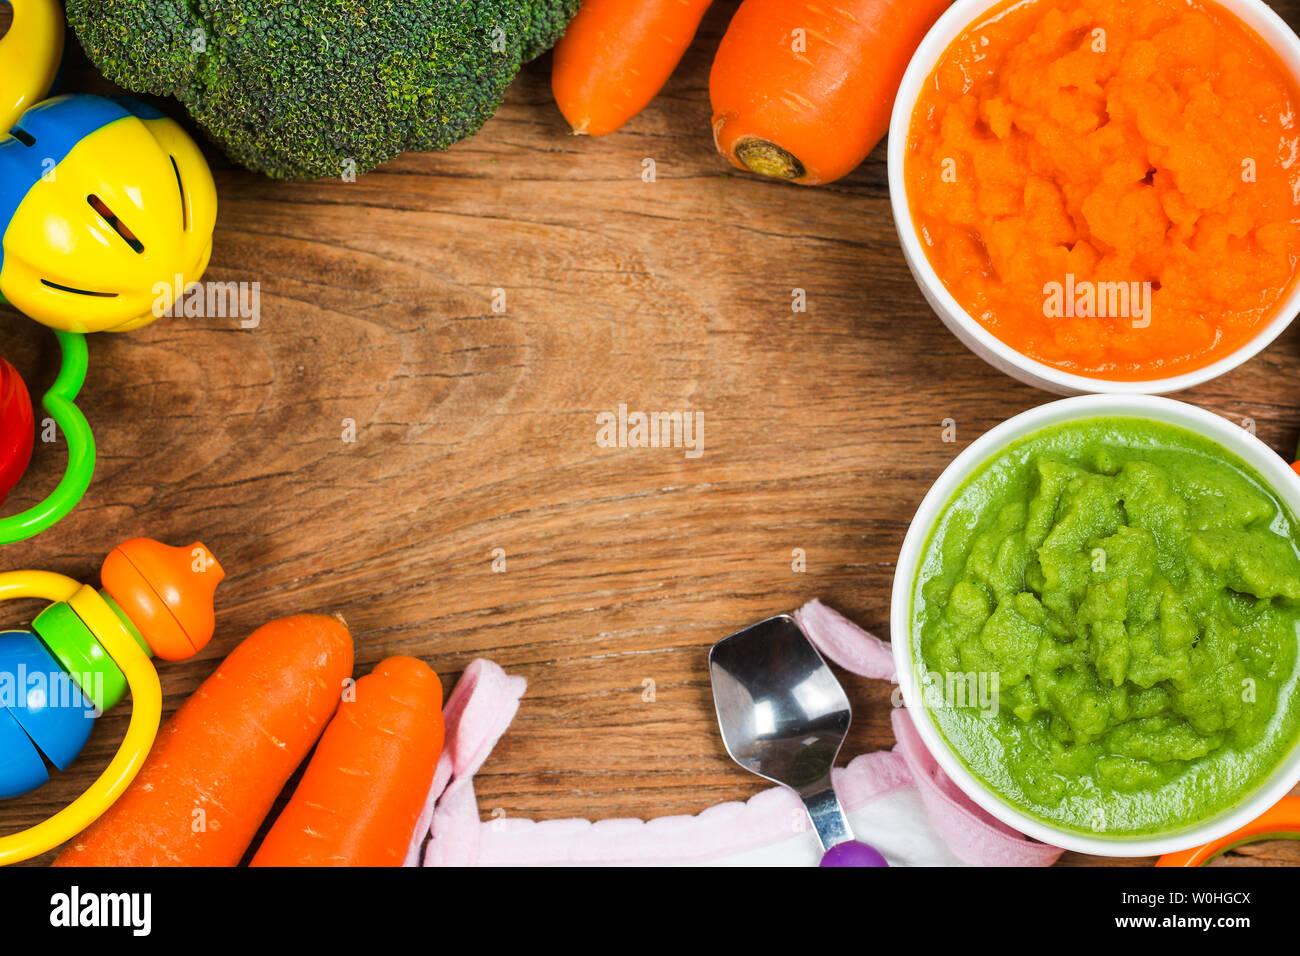 vegetable puree, carrots  pureed ,Broccoli pureed - Stock Image